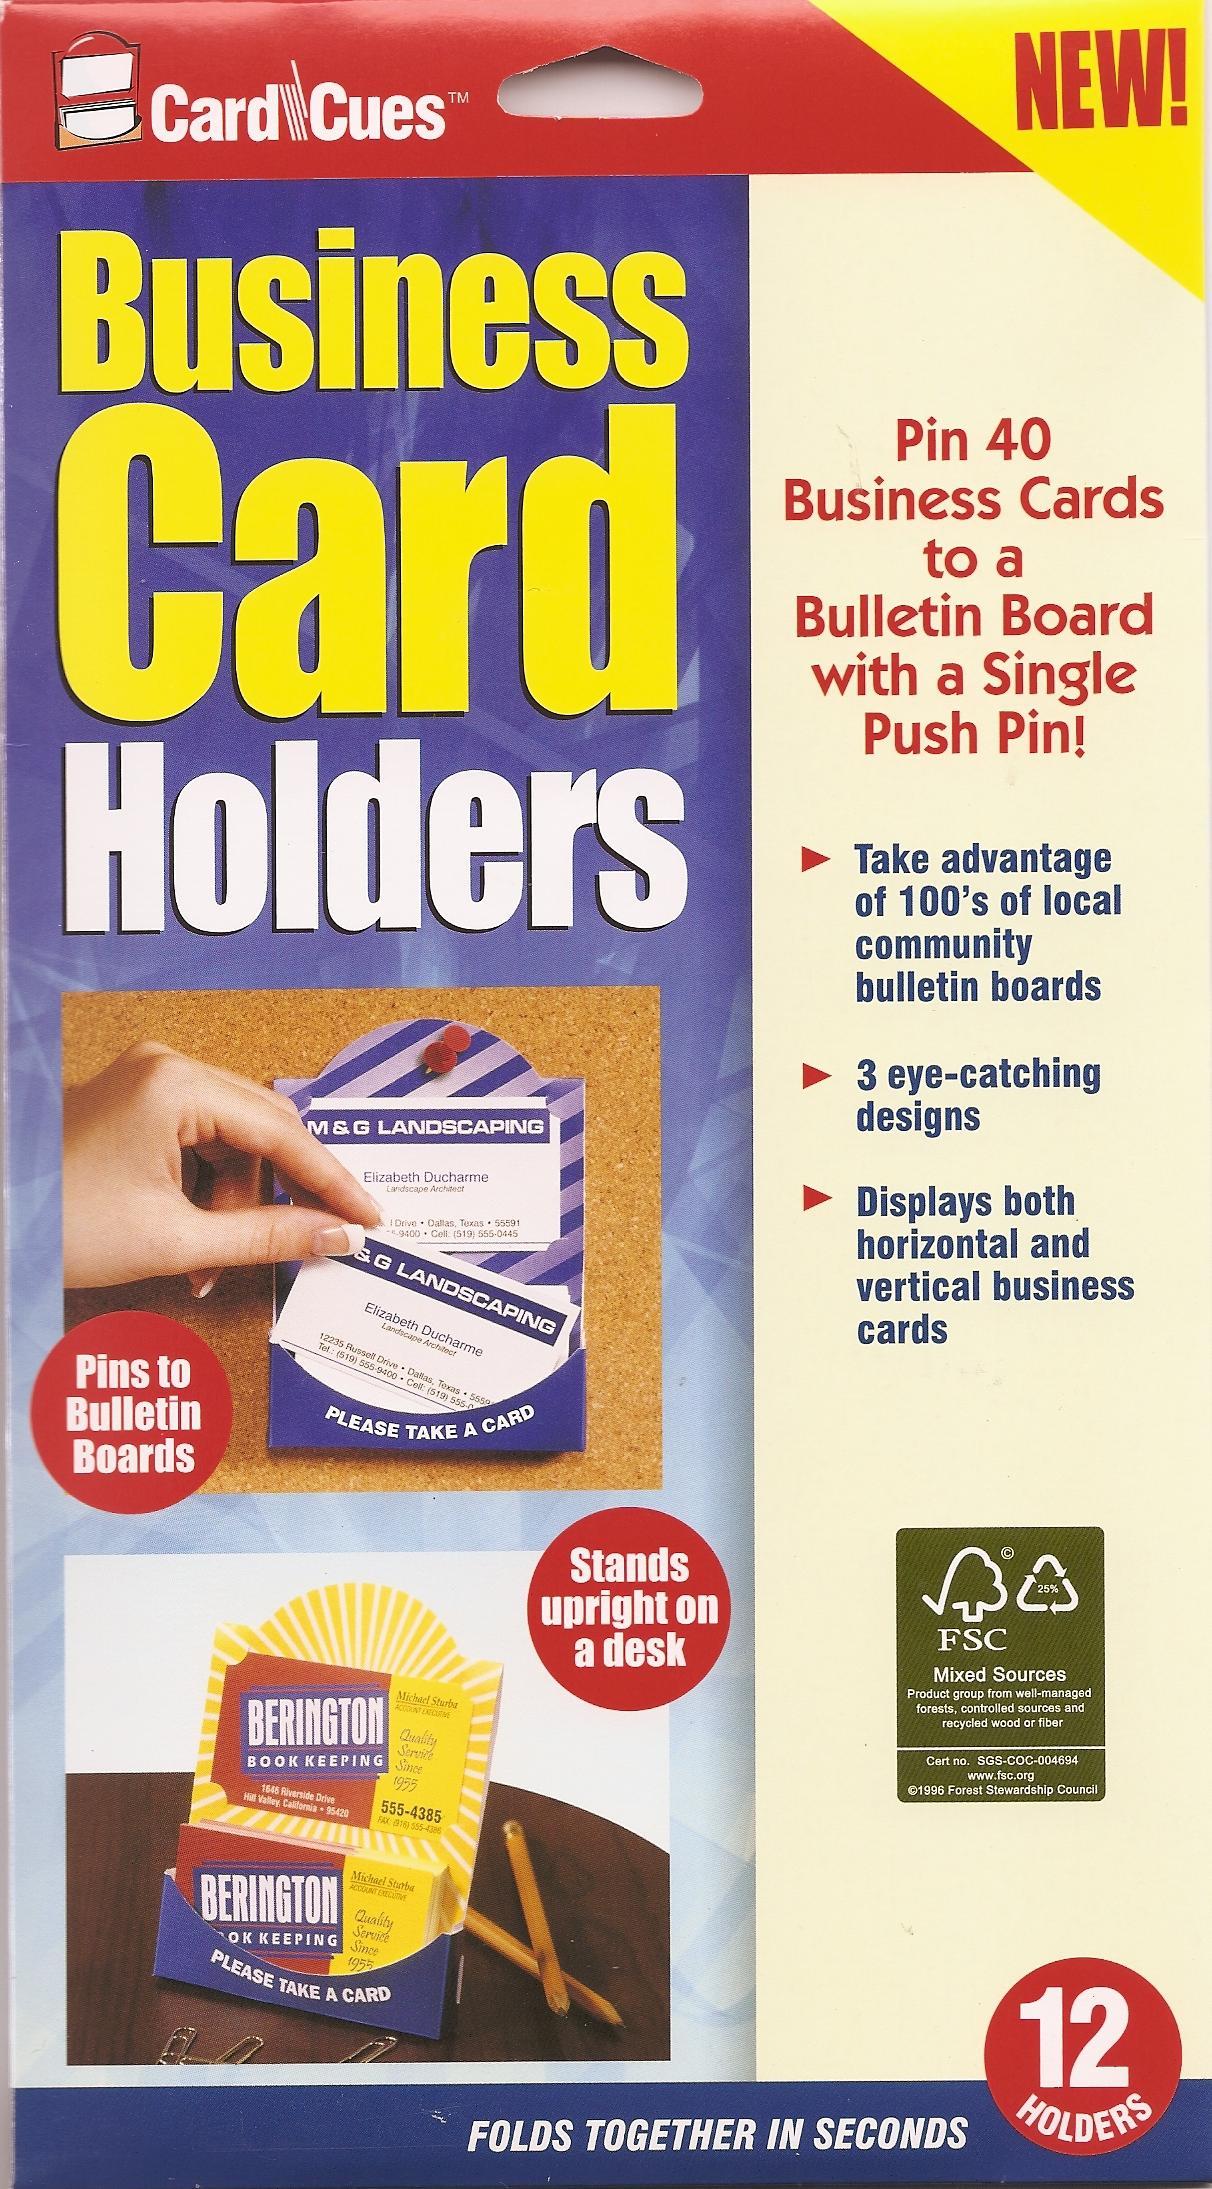 Clear Lake Enterprises Cardcues